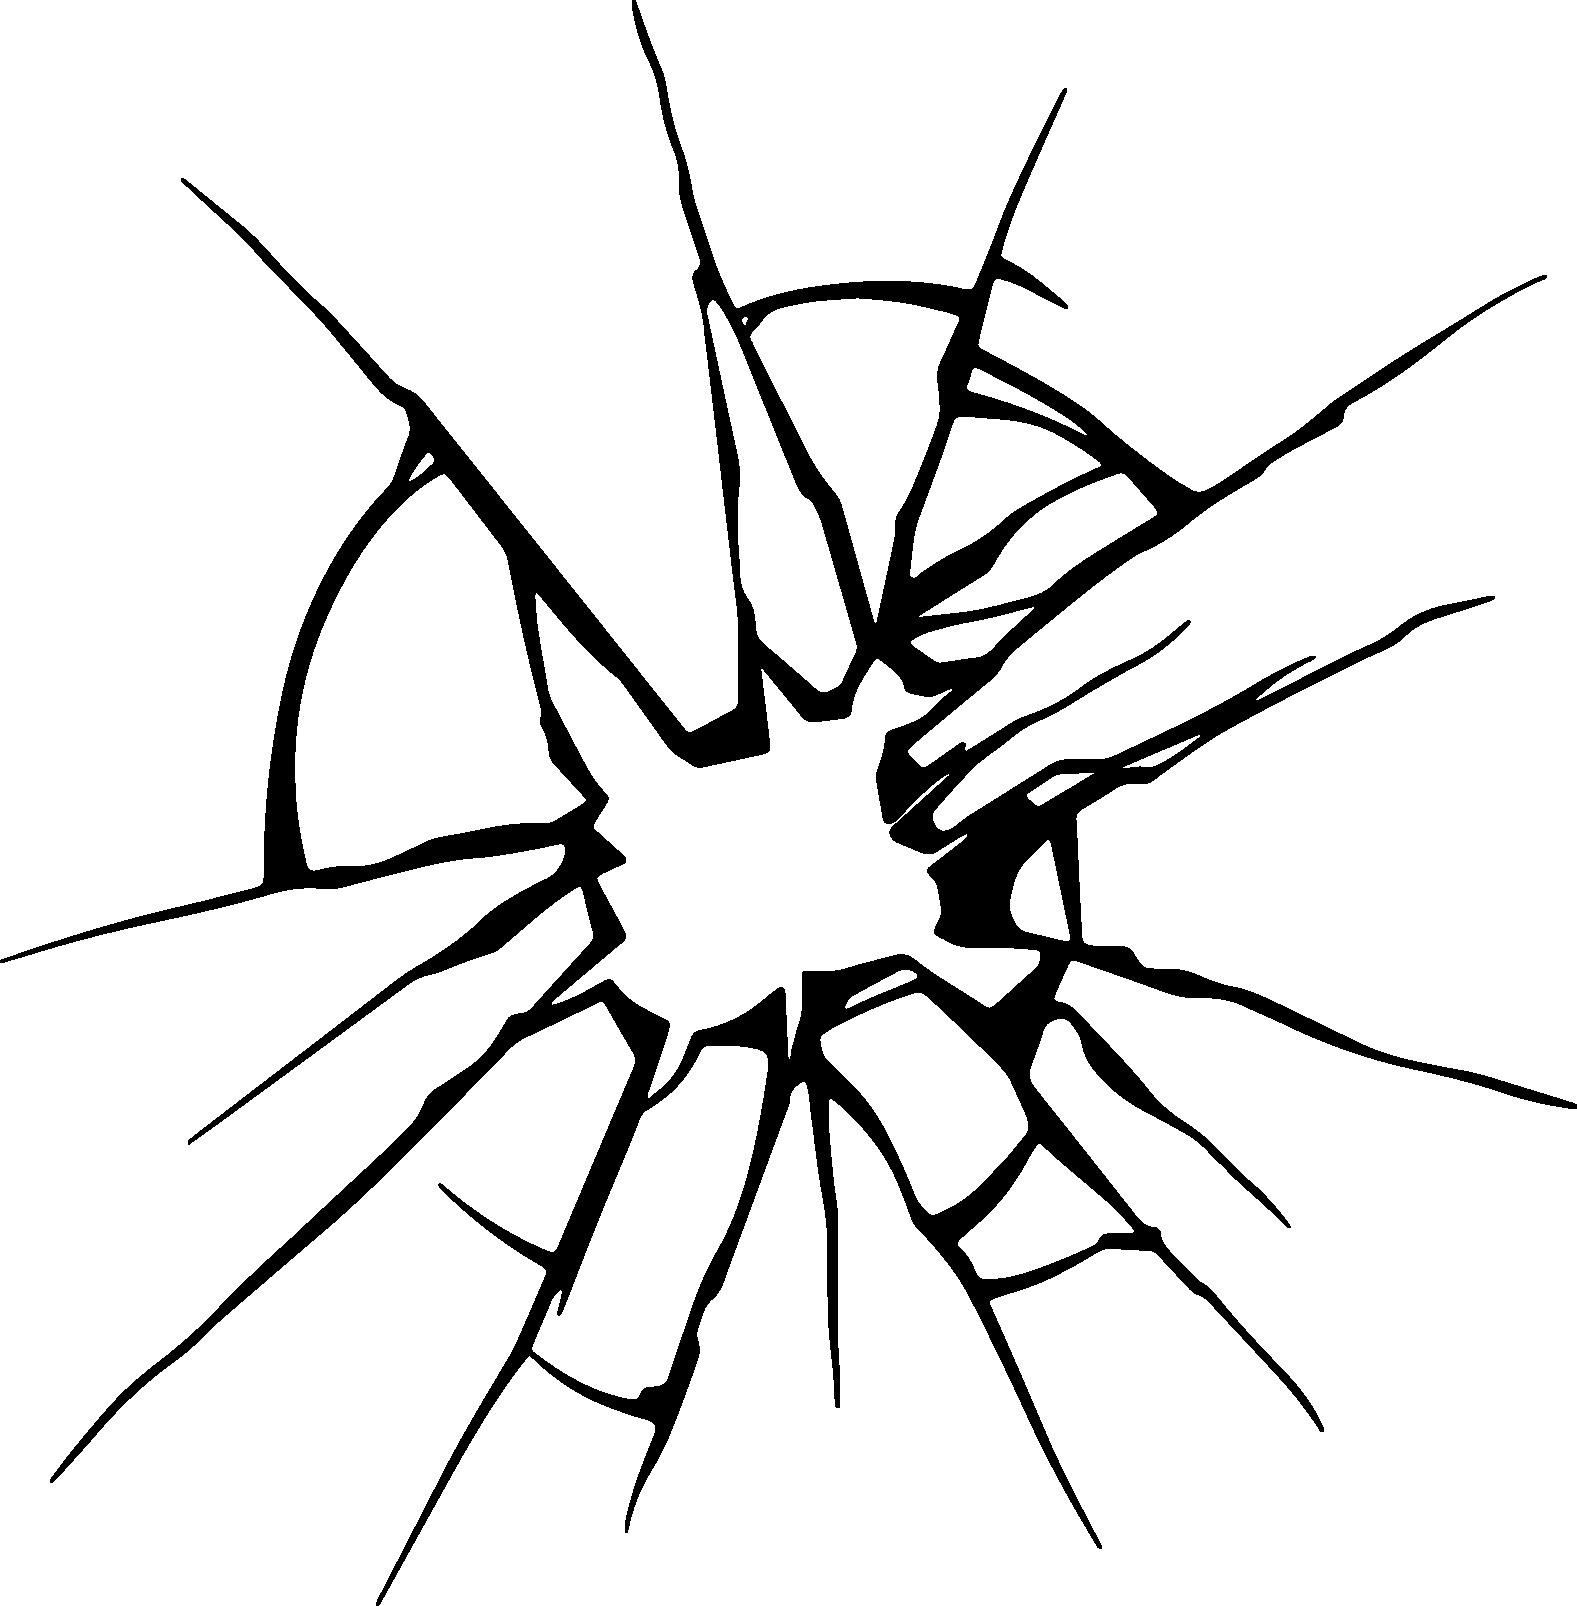 Cracked Glass Svg Broken Glass Svg Cracked Glass Svg Bundle Cracked Glass Clipart Shattered Glass Svg Cracked Glass Vector Silhouette Eps In 2021 Mirror Drawings Adobe Illustrator Graphic Design Skin Drawing